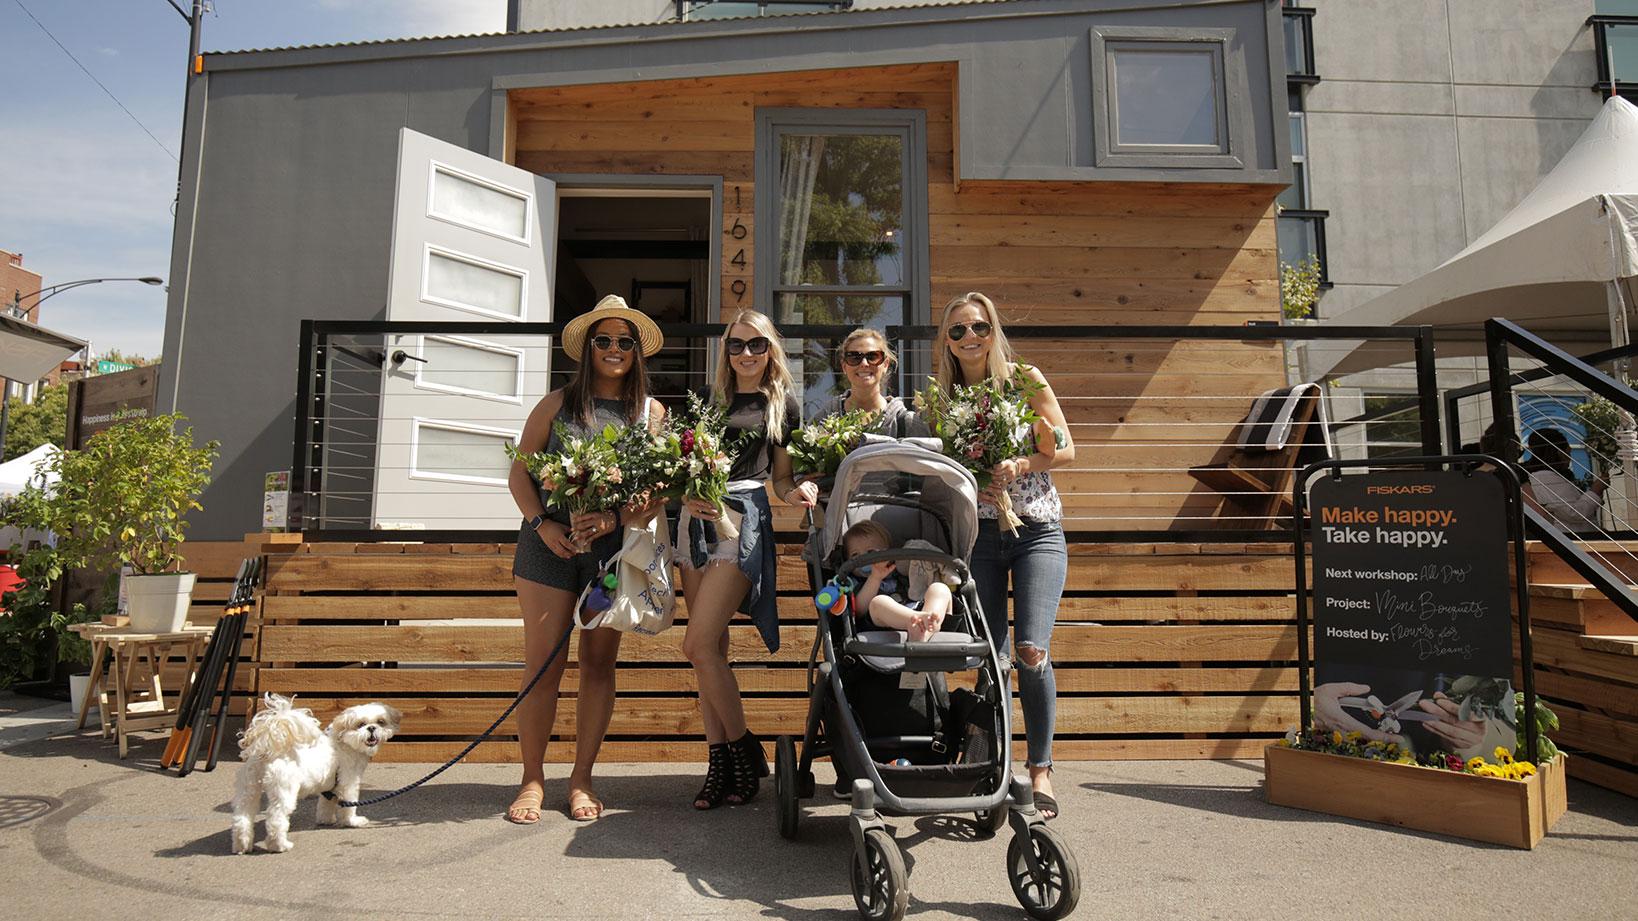 Fiskars Tiny Home –Sponsorship Activation and Tour Management